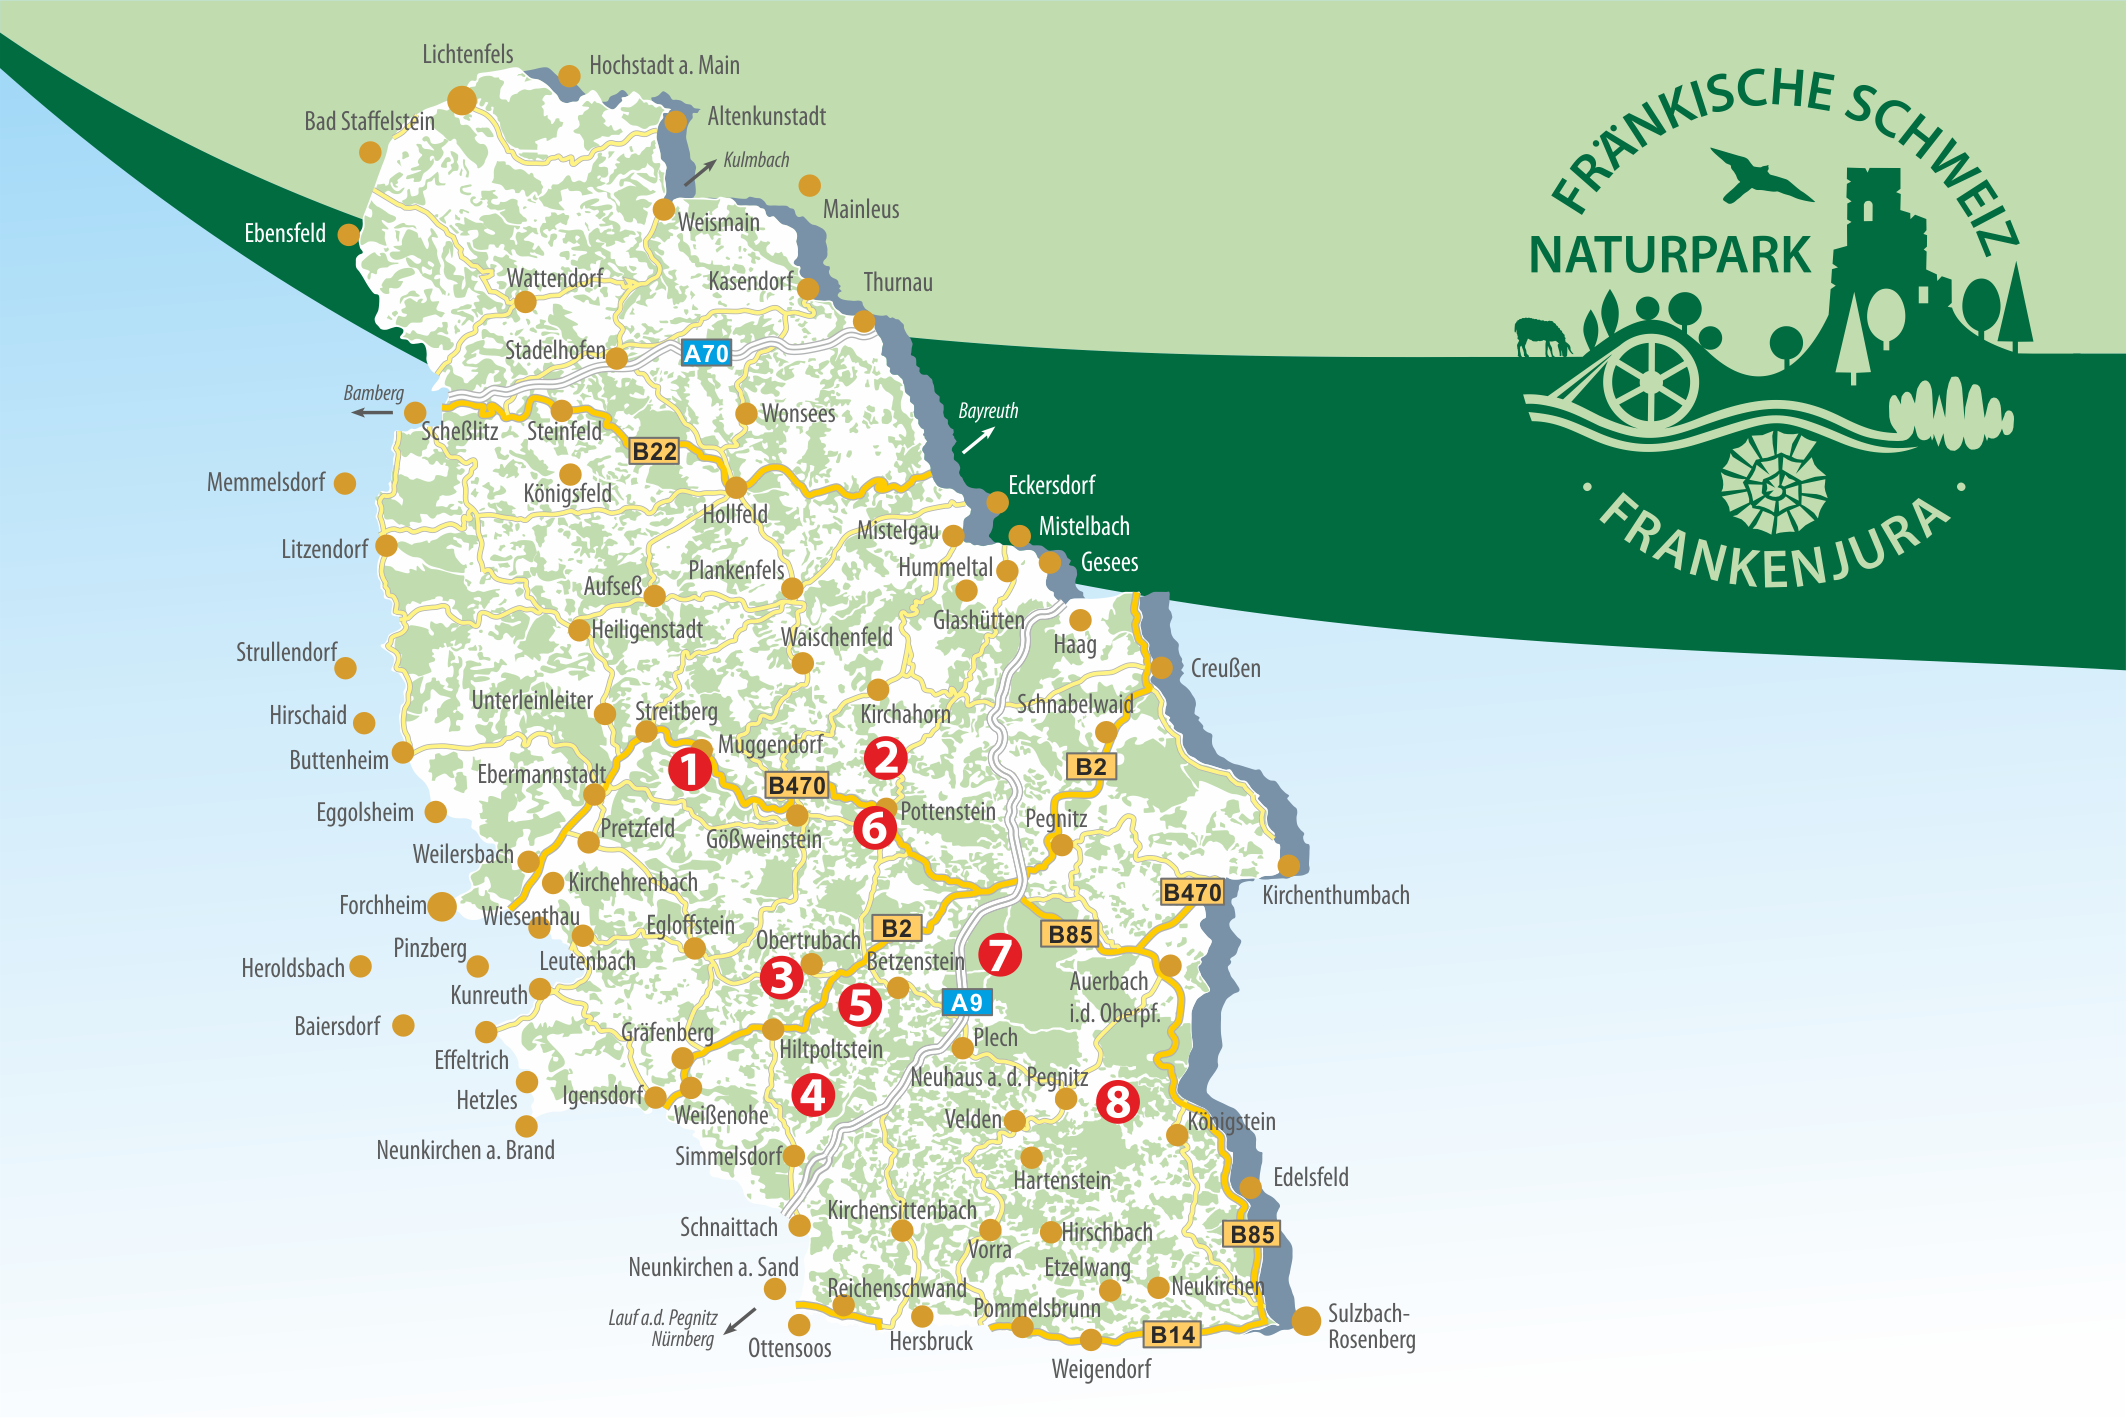 Naturparkkarten